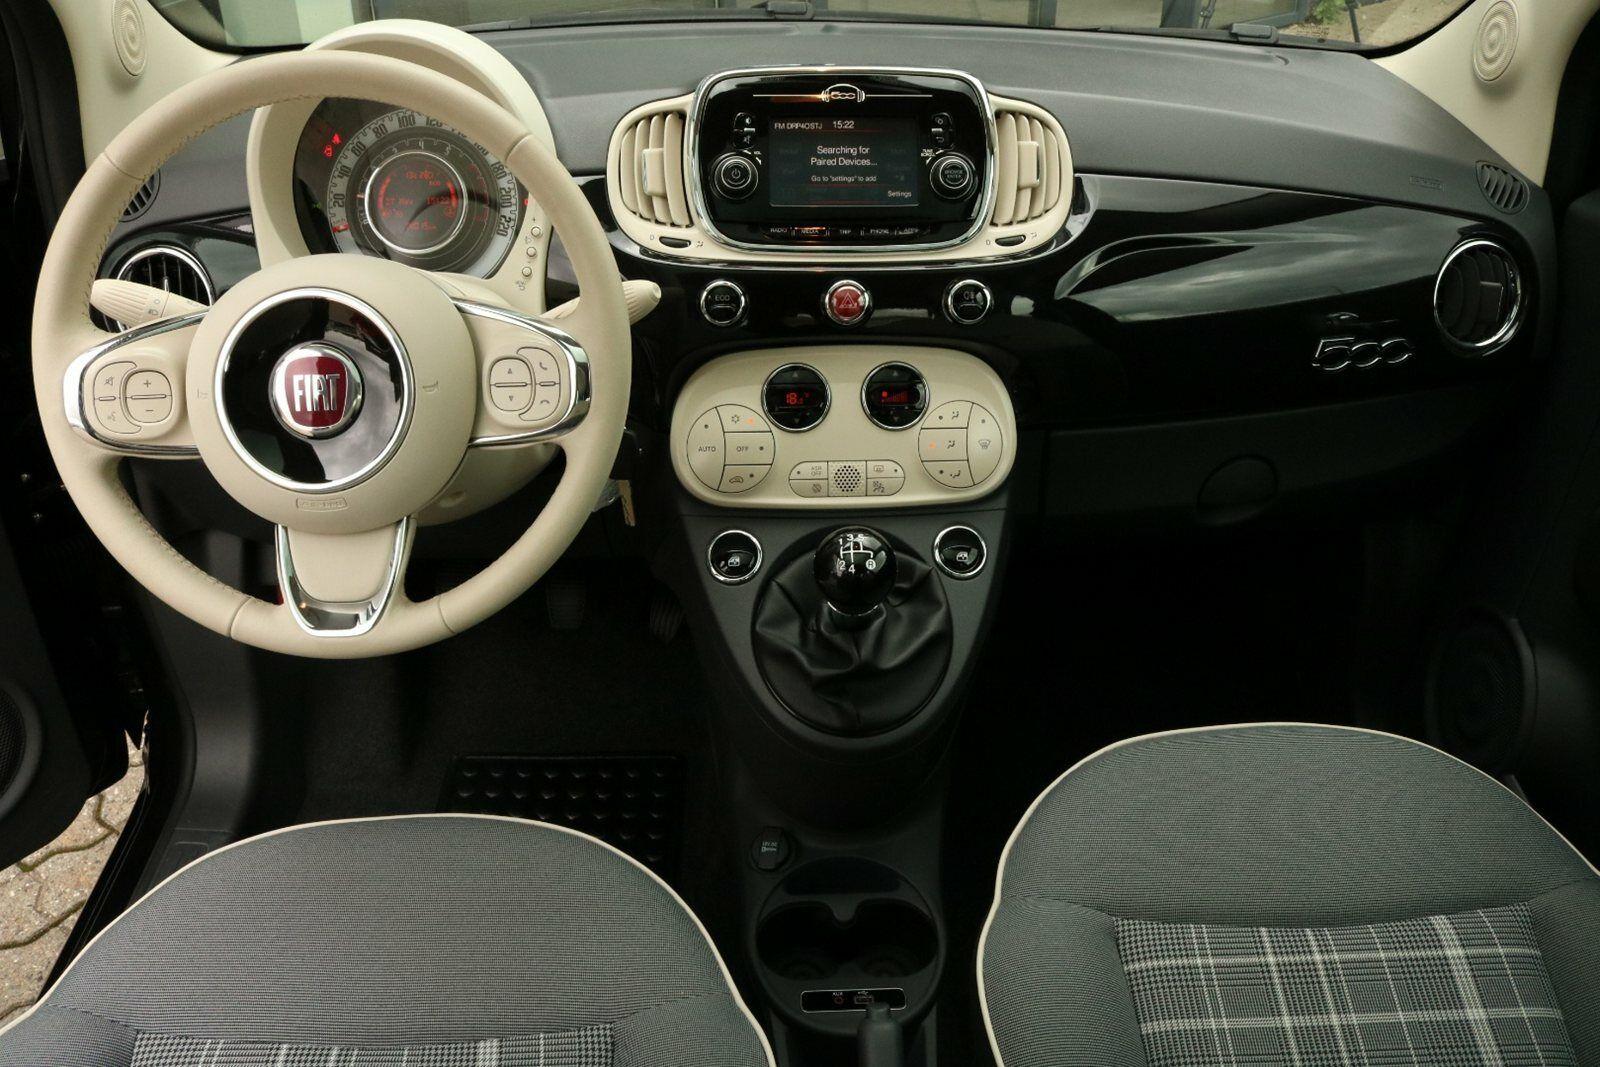 Fiat 500 TwinAir 80 Esclusivo